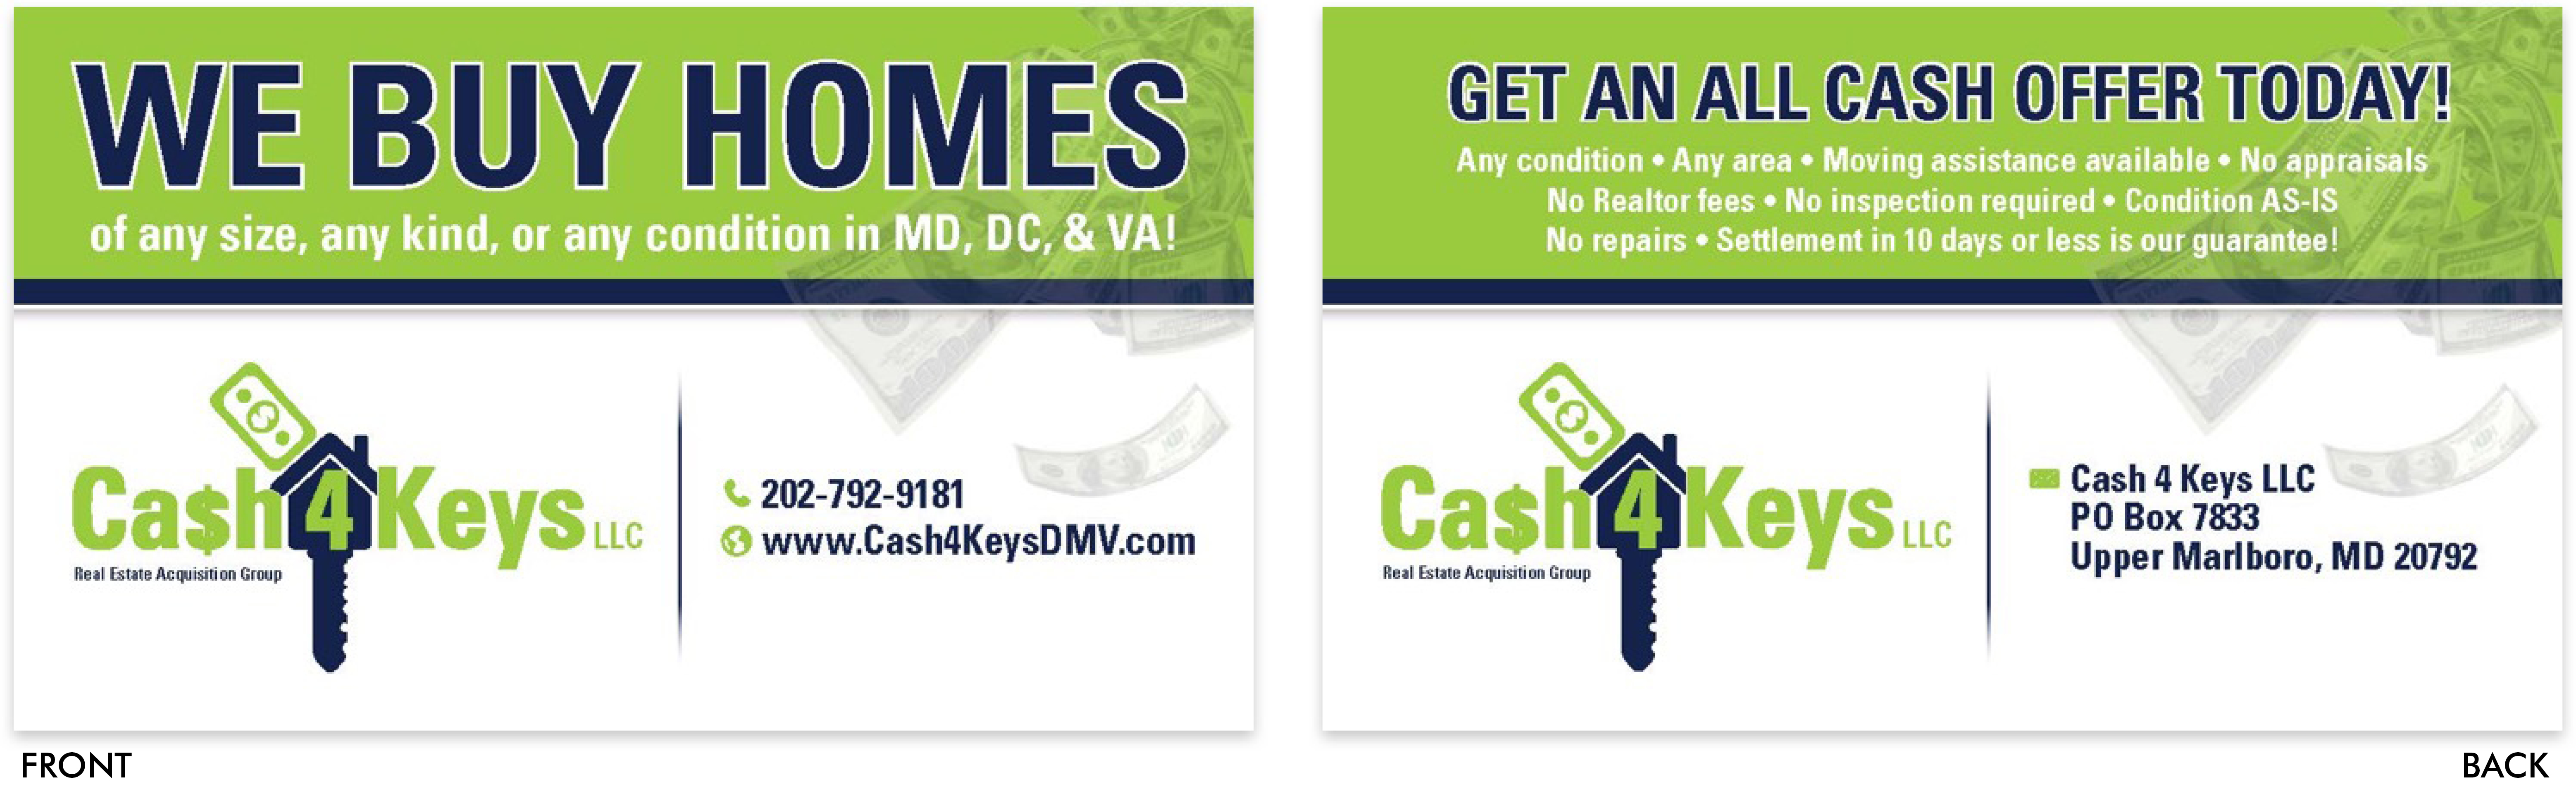 Cash 4 Keys Business Card